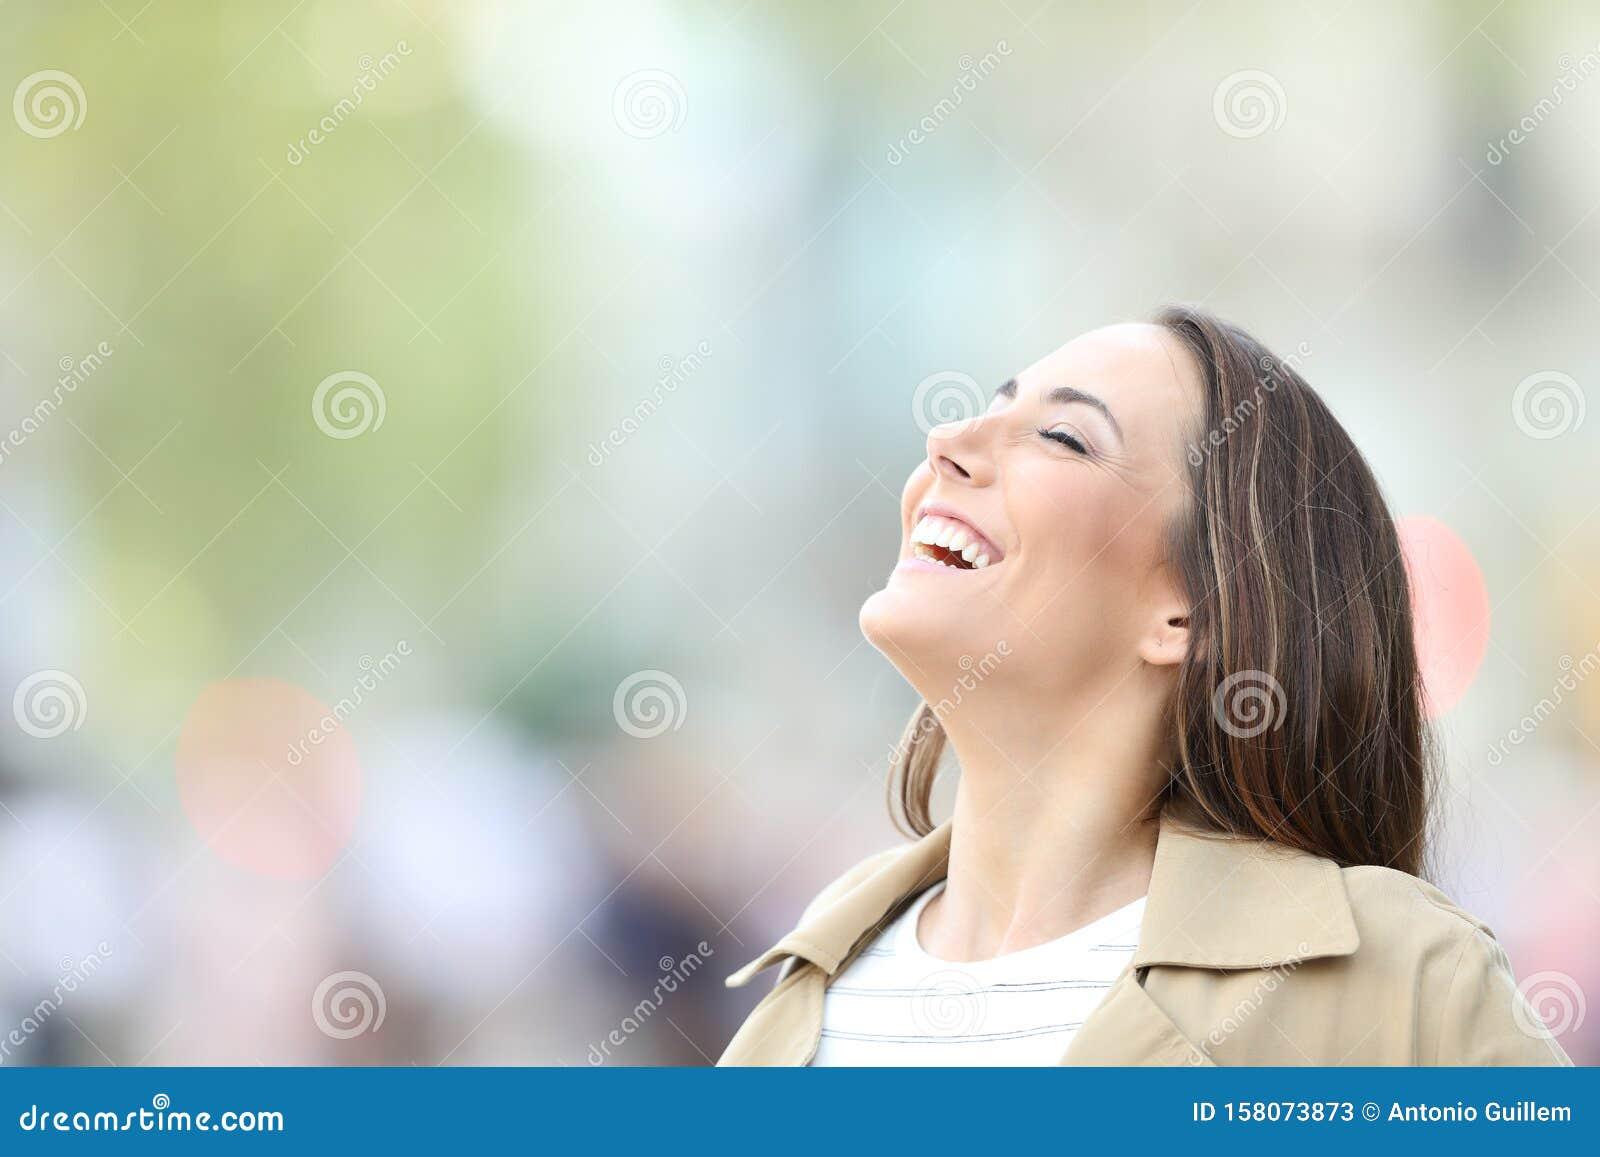 Happy woman breathing fresh air in the street